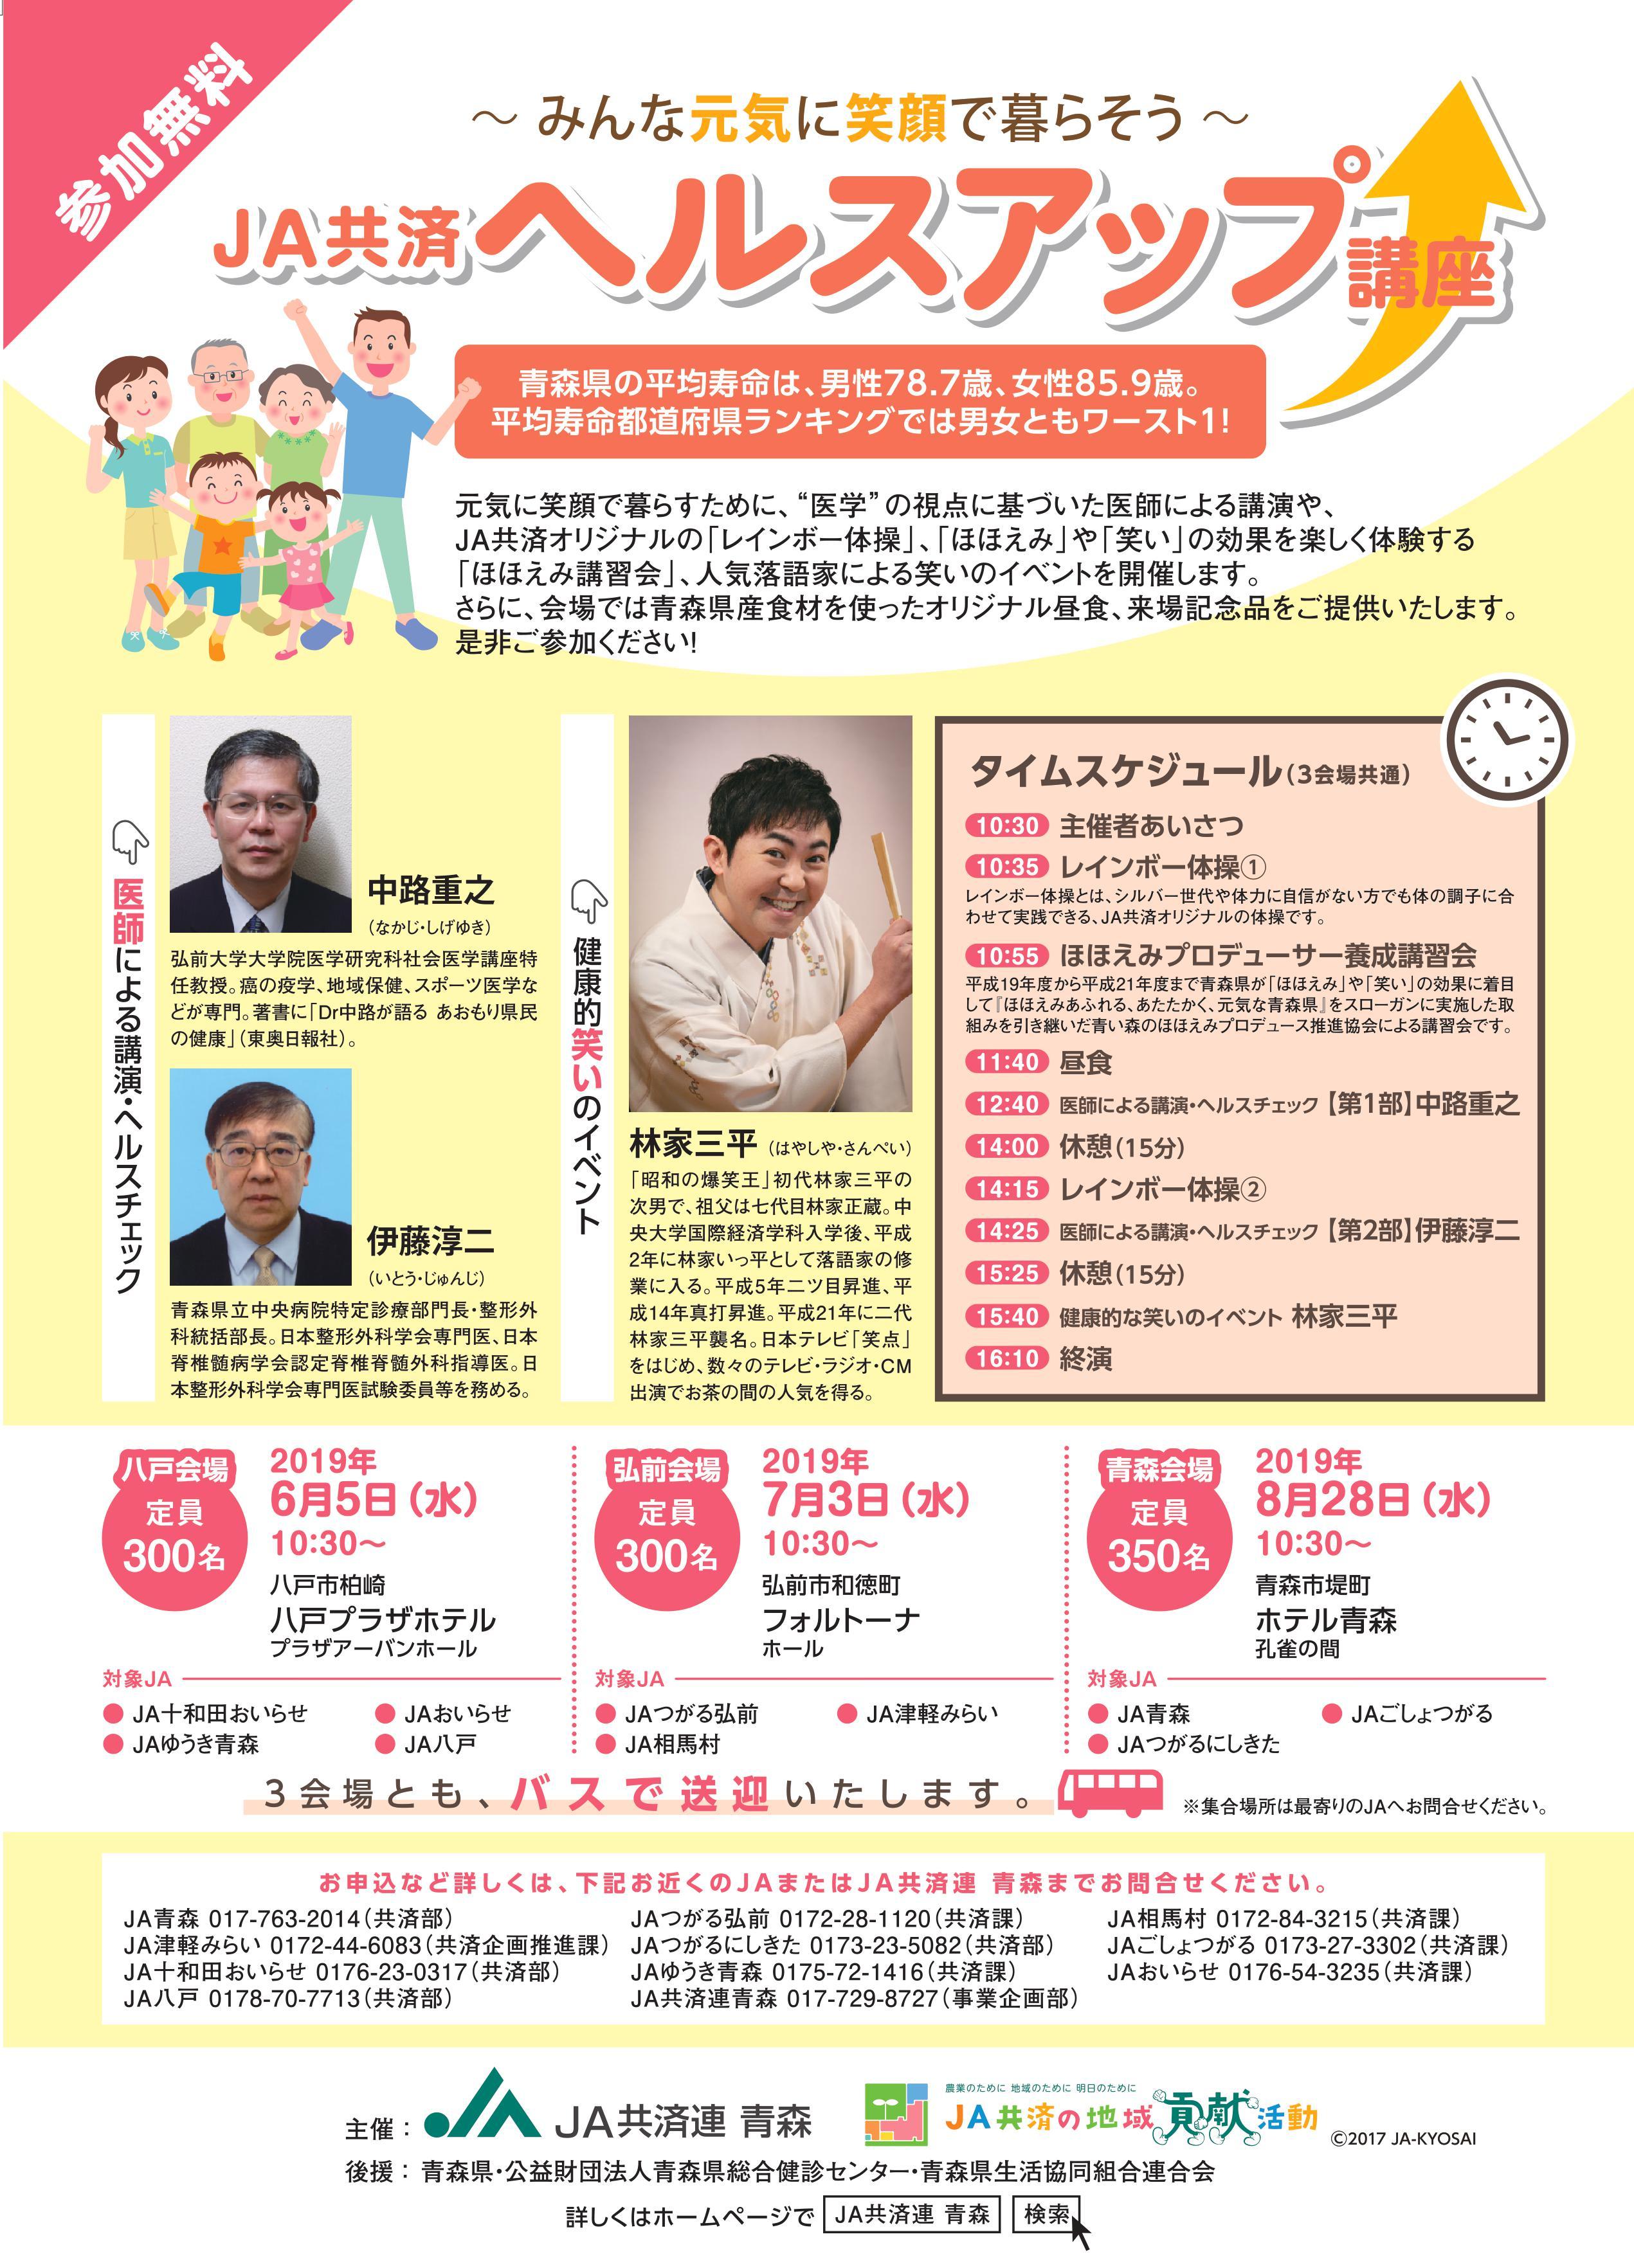 「JA共済ヘルスアップ講座」チラシデータ